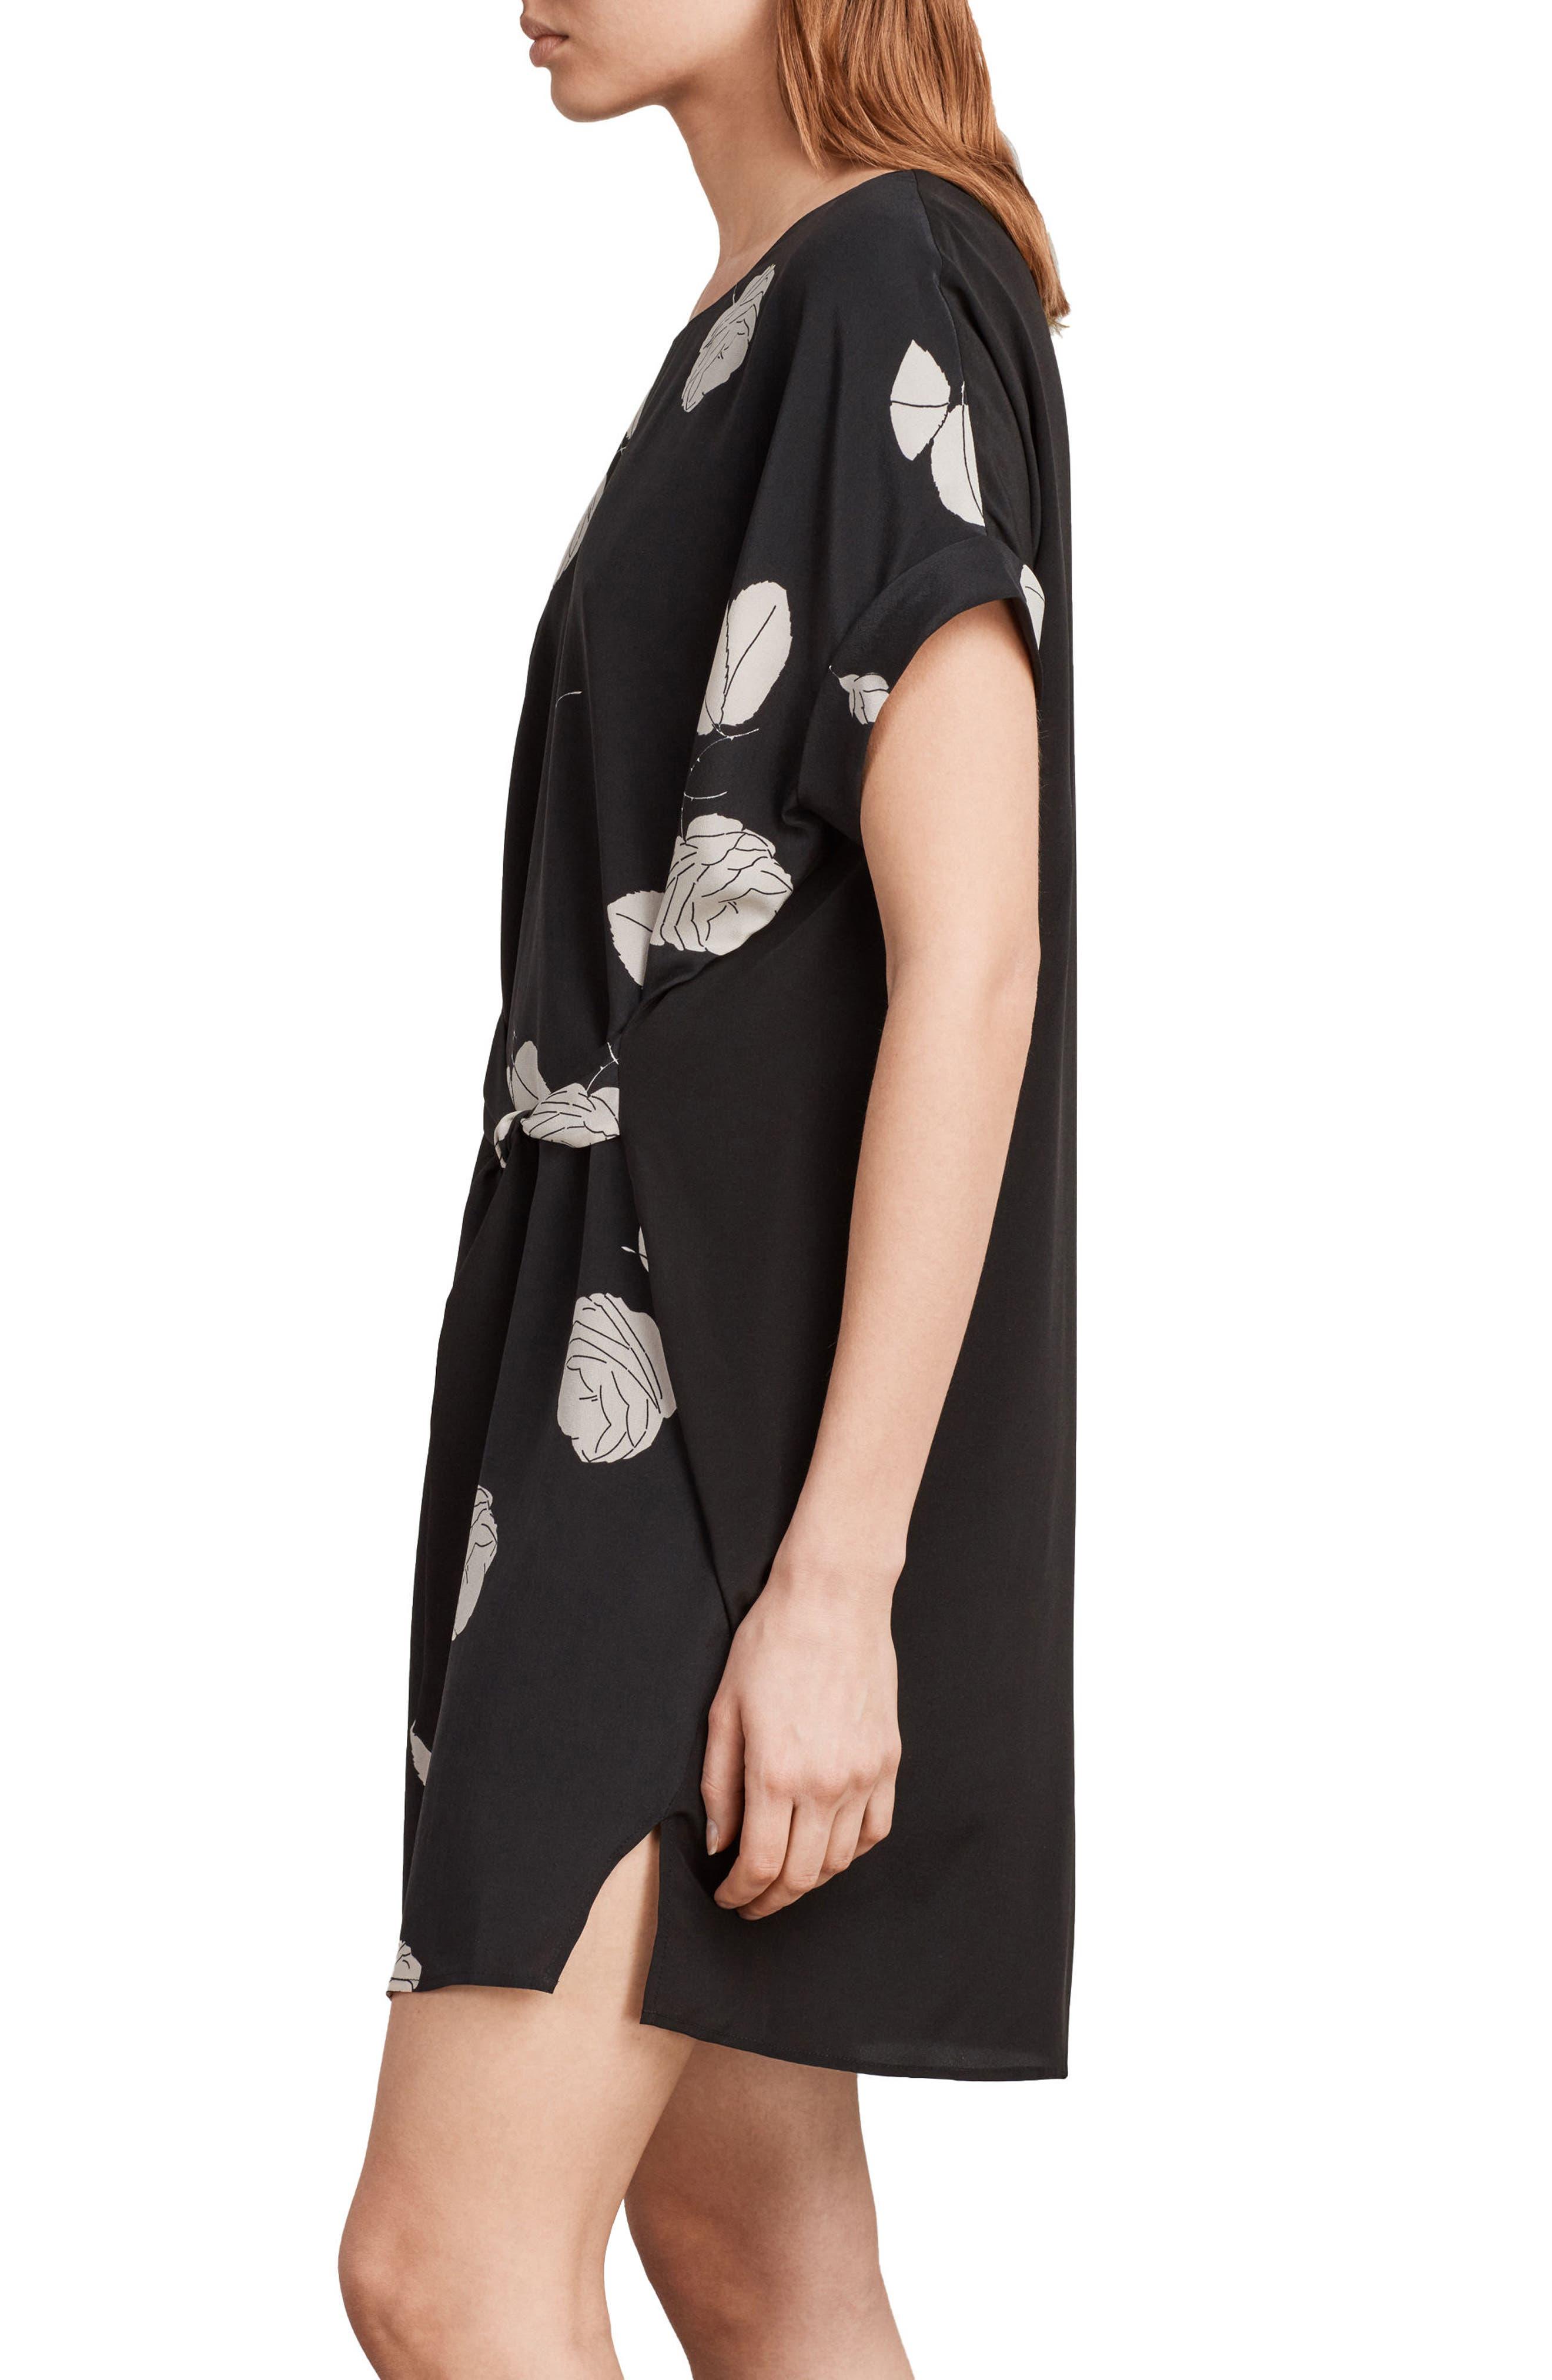 Sonny Rodin Silk Dress,                             Alternate thumbnail 3, color,                             001